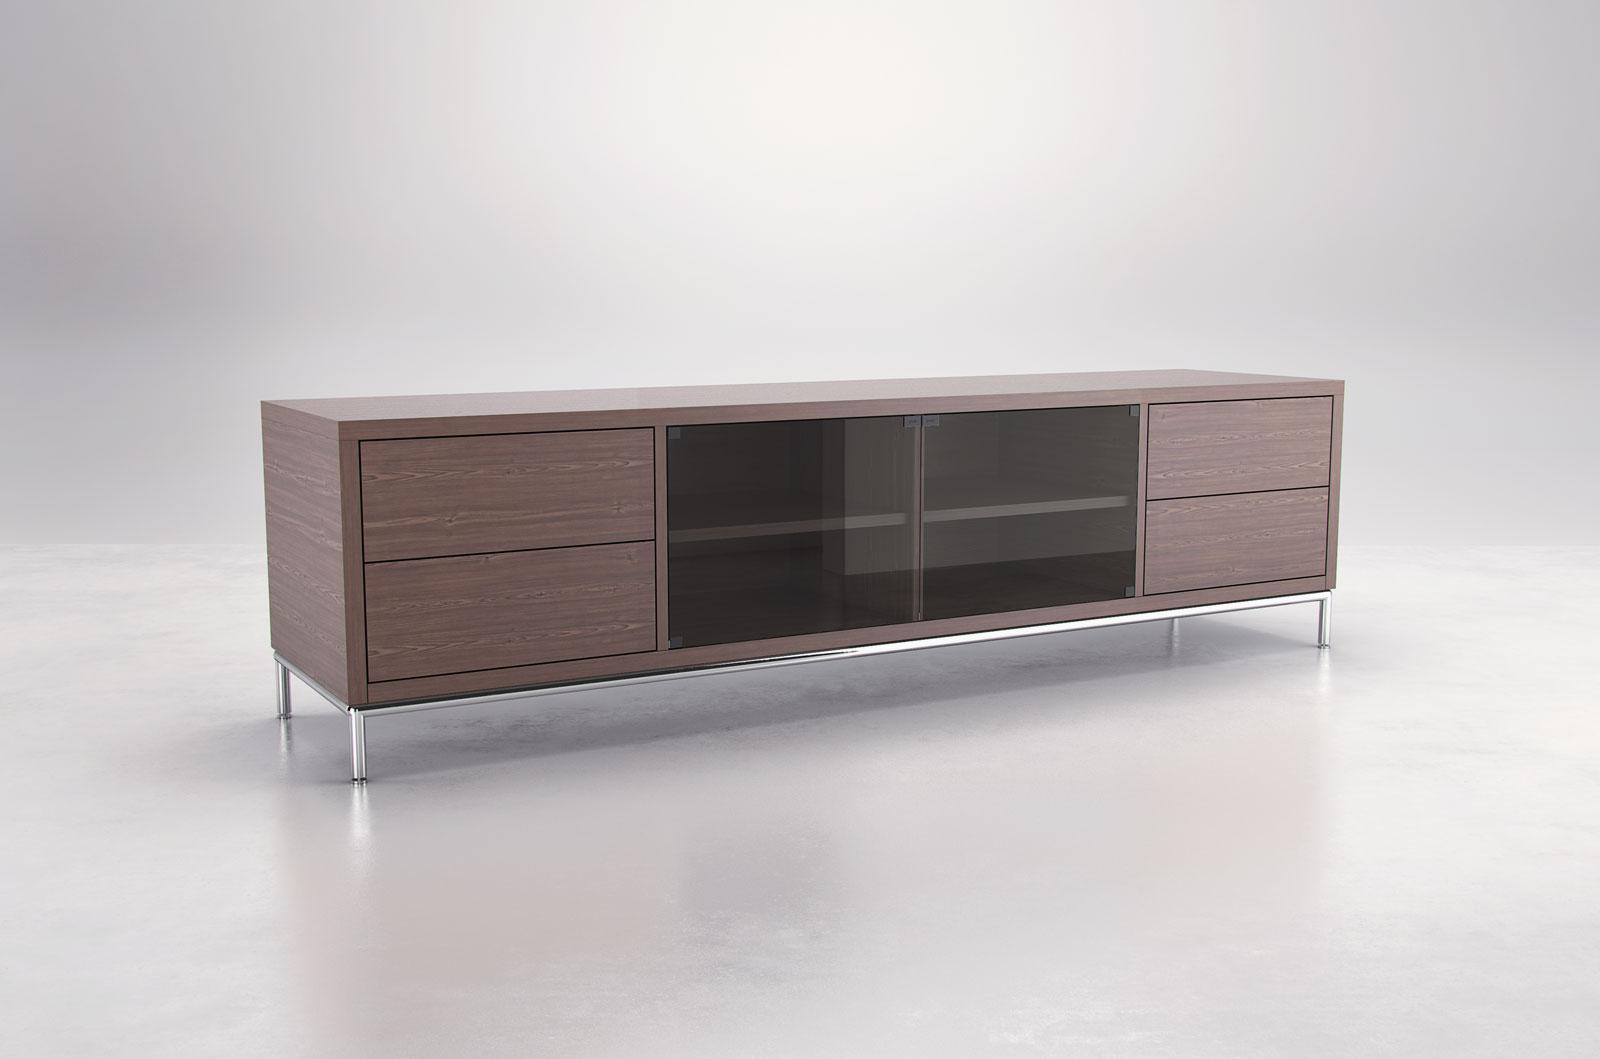 extra long contemporary tv entertainment unit with storage san antonio texas mllen. Black Bedroom Furniture Sets. Home Design Ideas